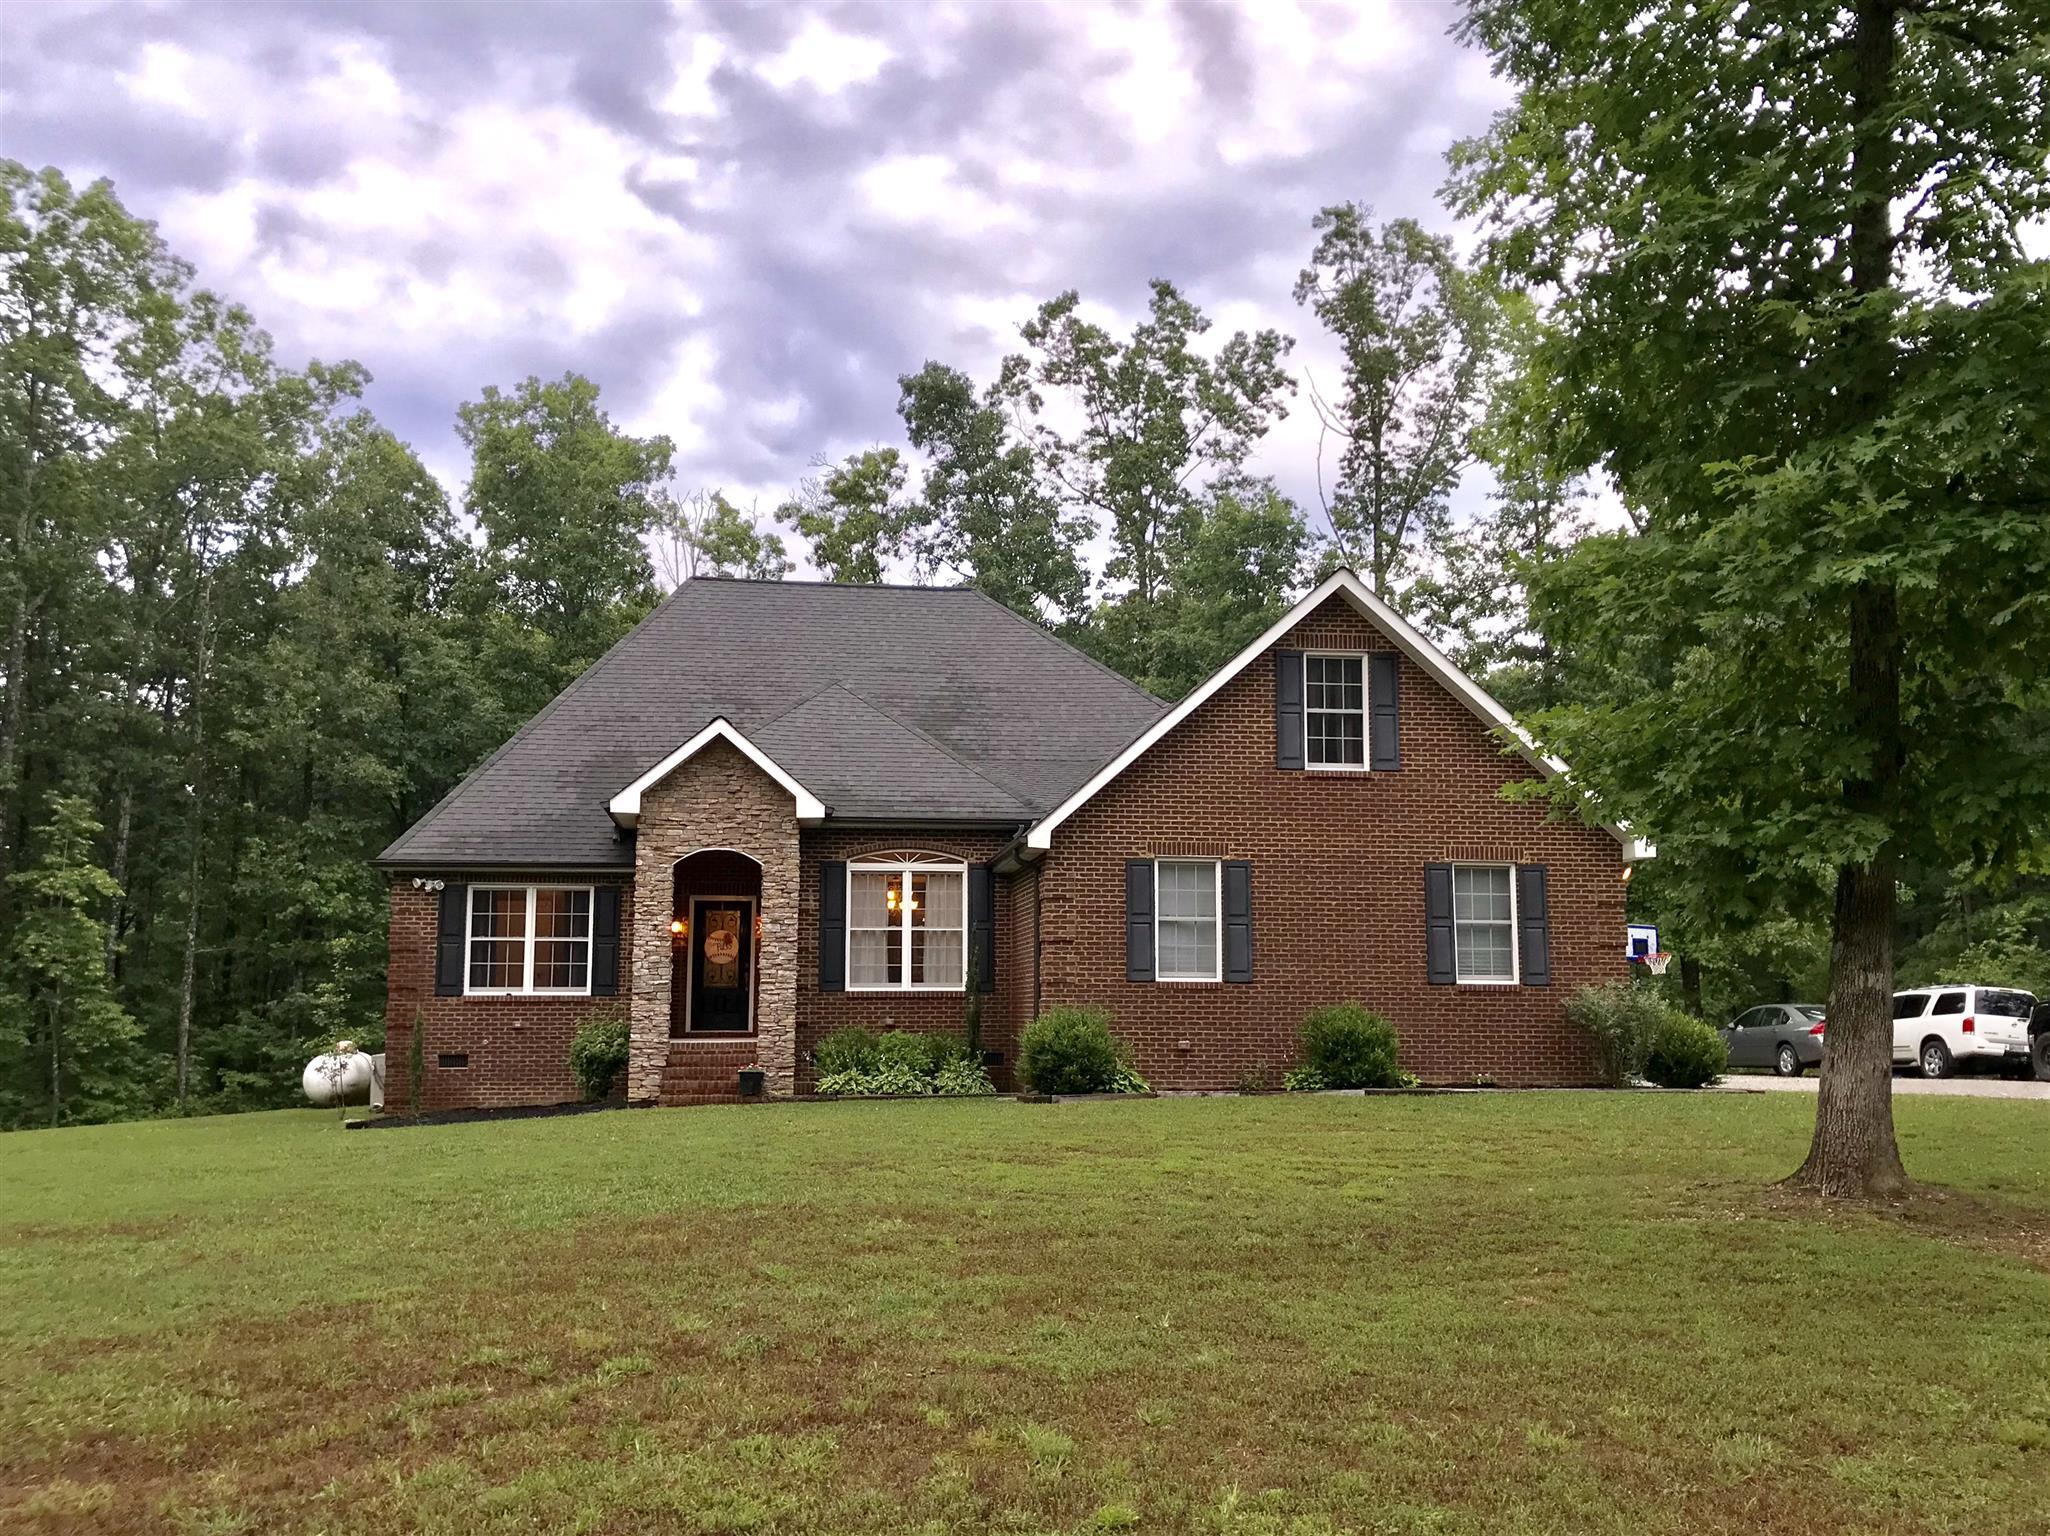 31 Chickory Ln, Monteagle, TN 37356 - Monteagle, TN real estate listing